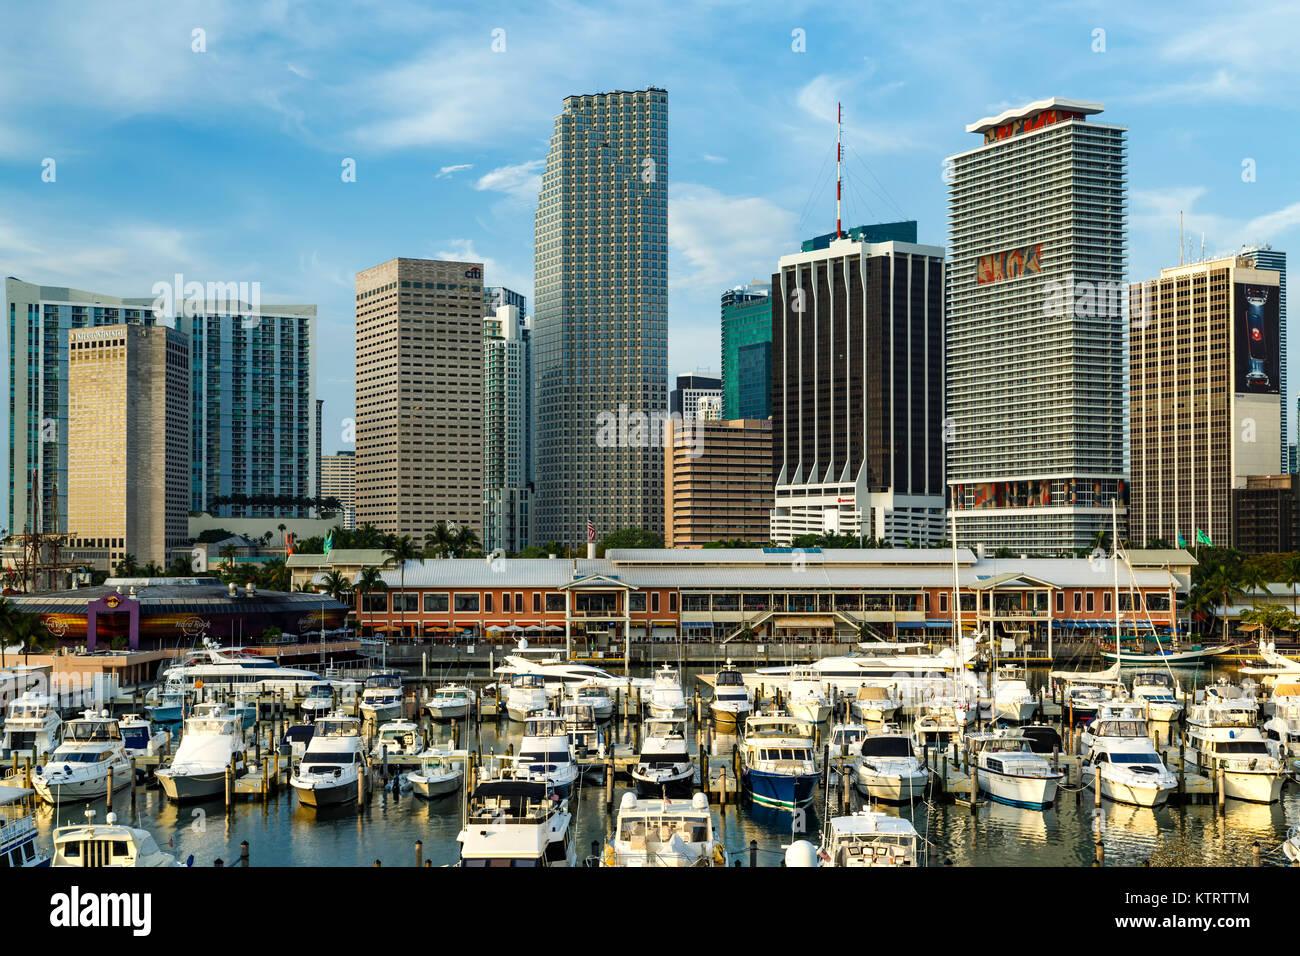 Boats in Marina at Bayfront Marketplace and skyscrapers, Miami, Florida USA Stock Photo